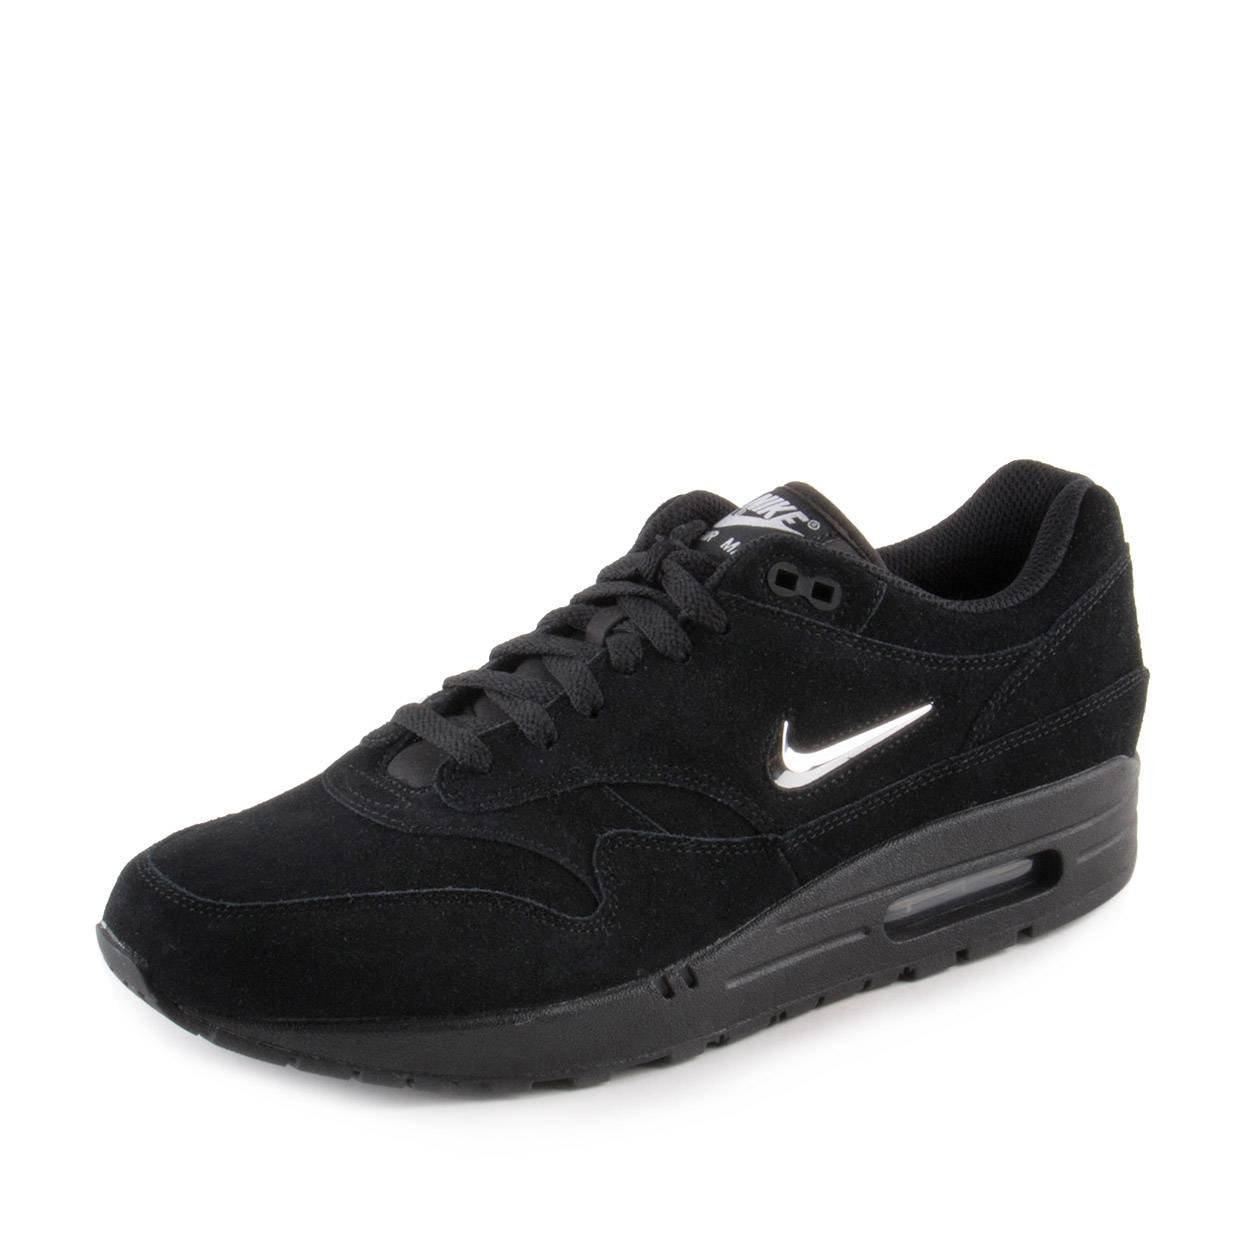 wholesale dealer e632d 014e7 Galleon - Nike Air Max 1 Premium SC Mens Running Shoes (9.5 D(M) US)